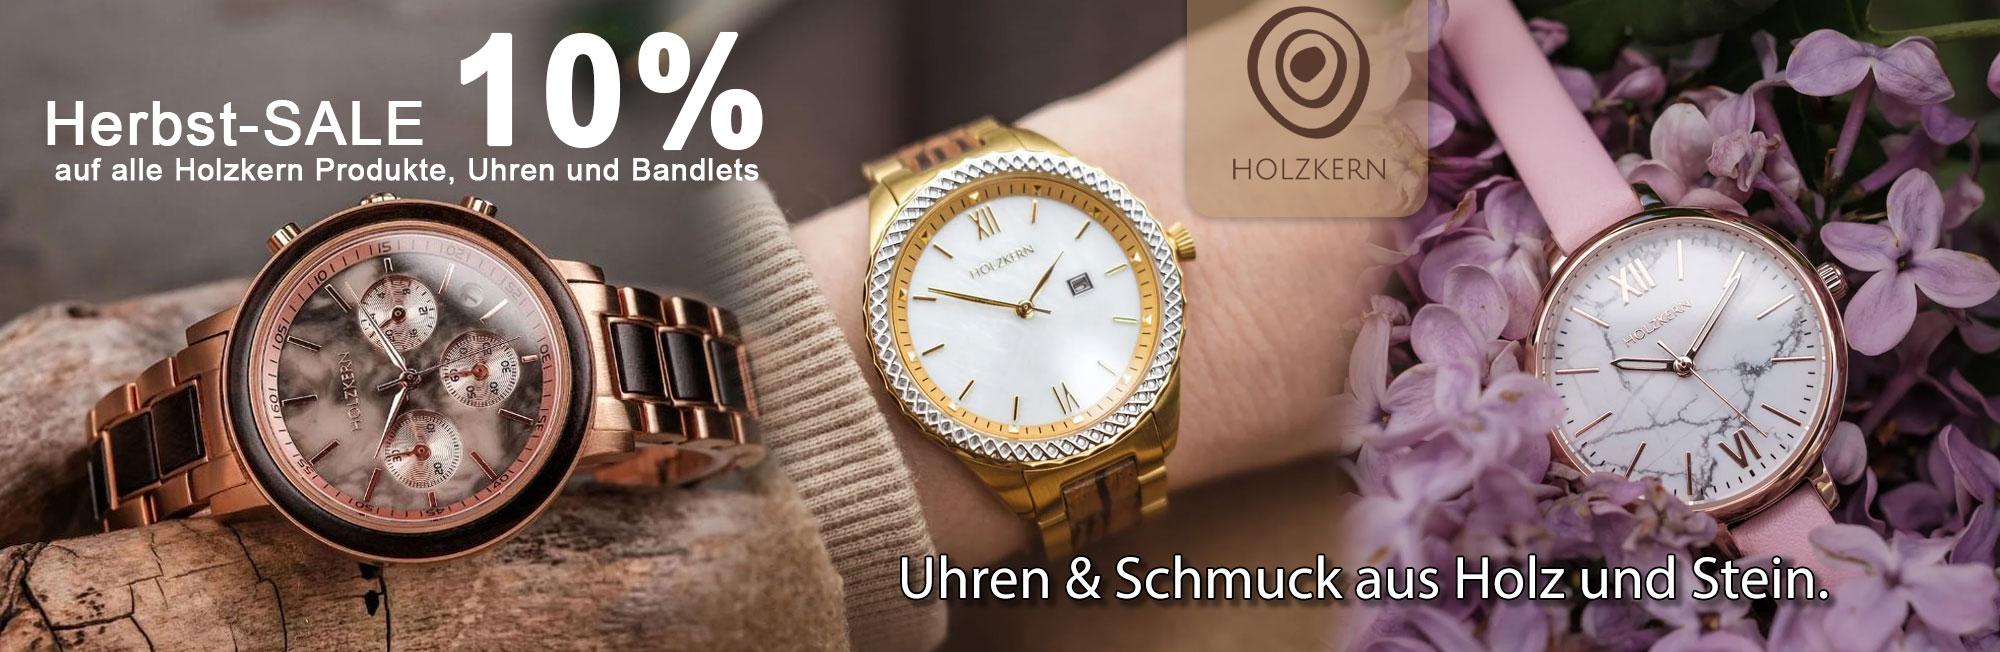 20211022_Herbstsale_Shopbanner_Holzkern